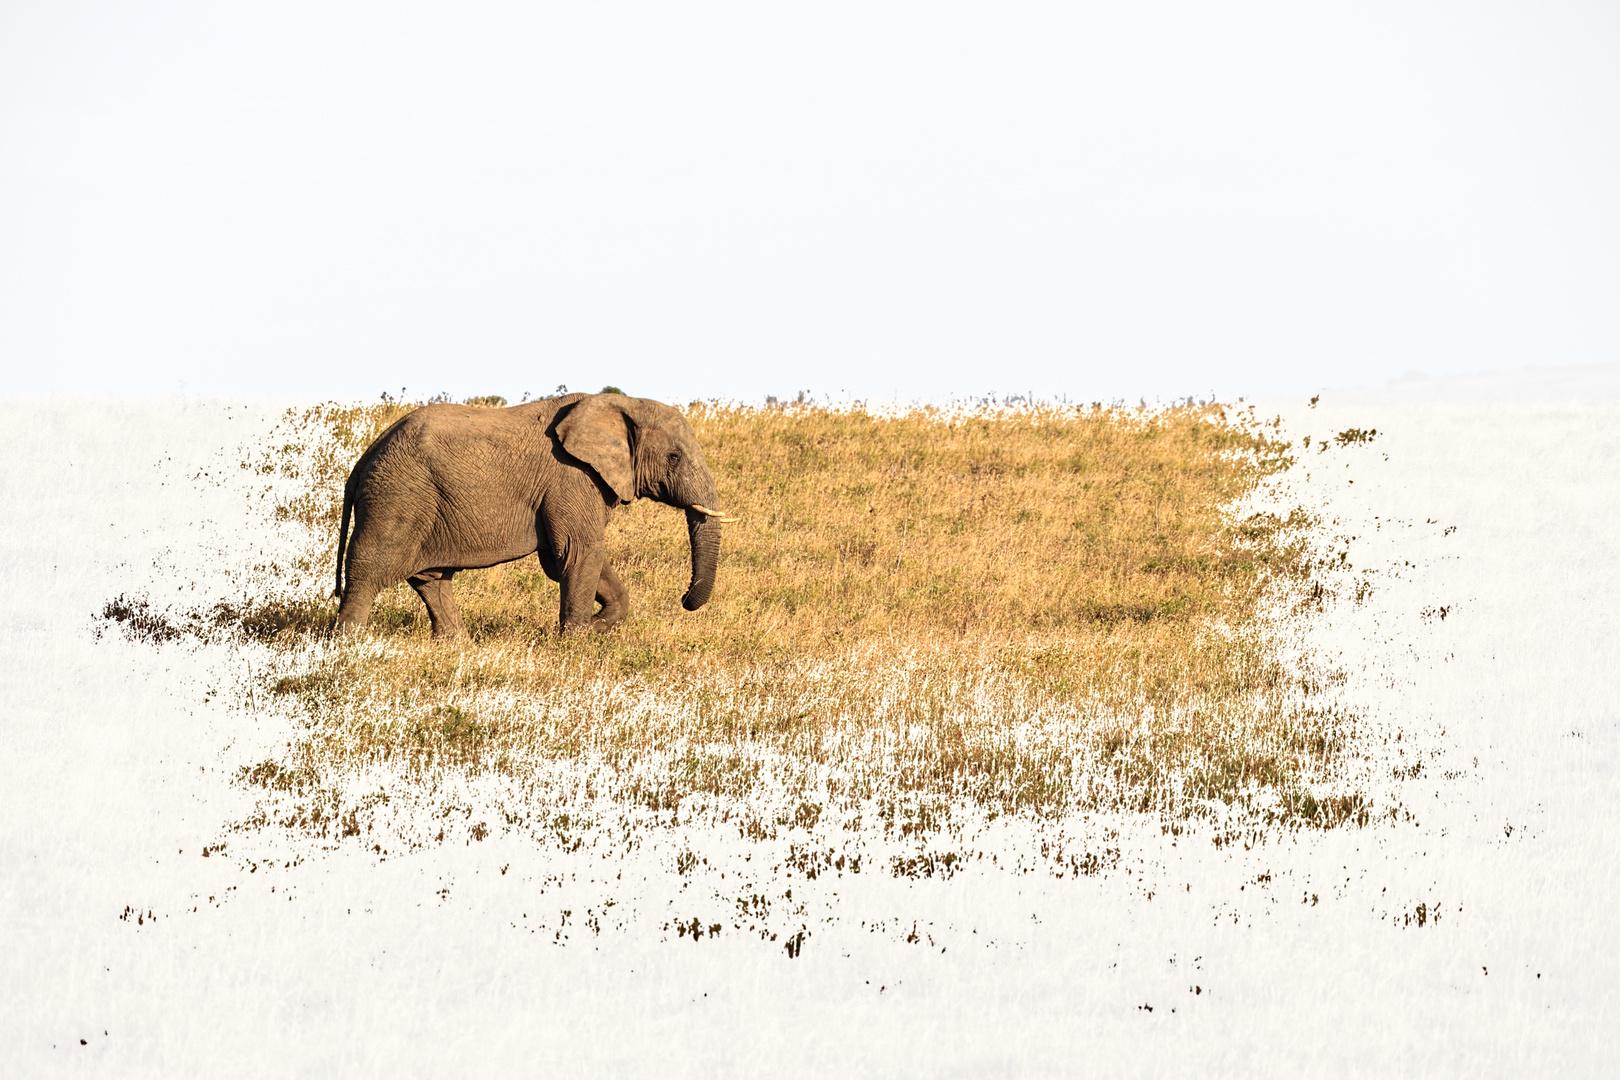 Elefant Einsam